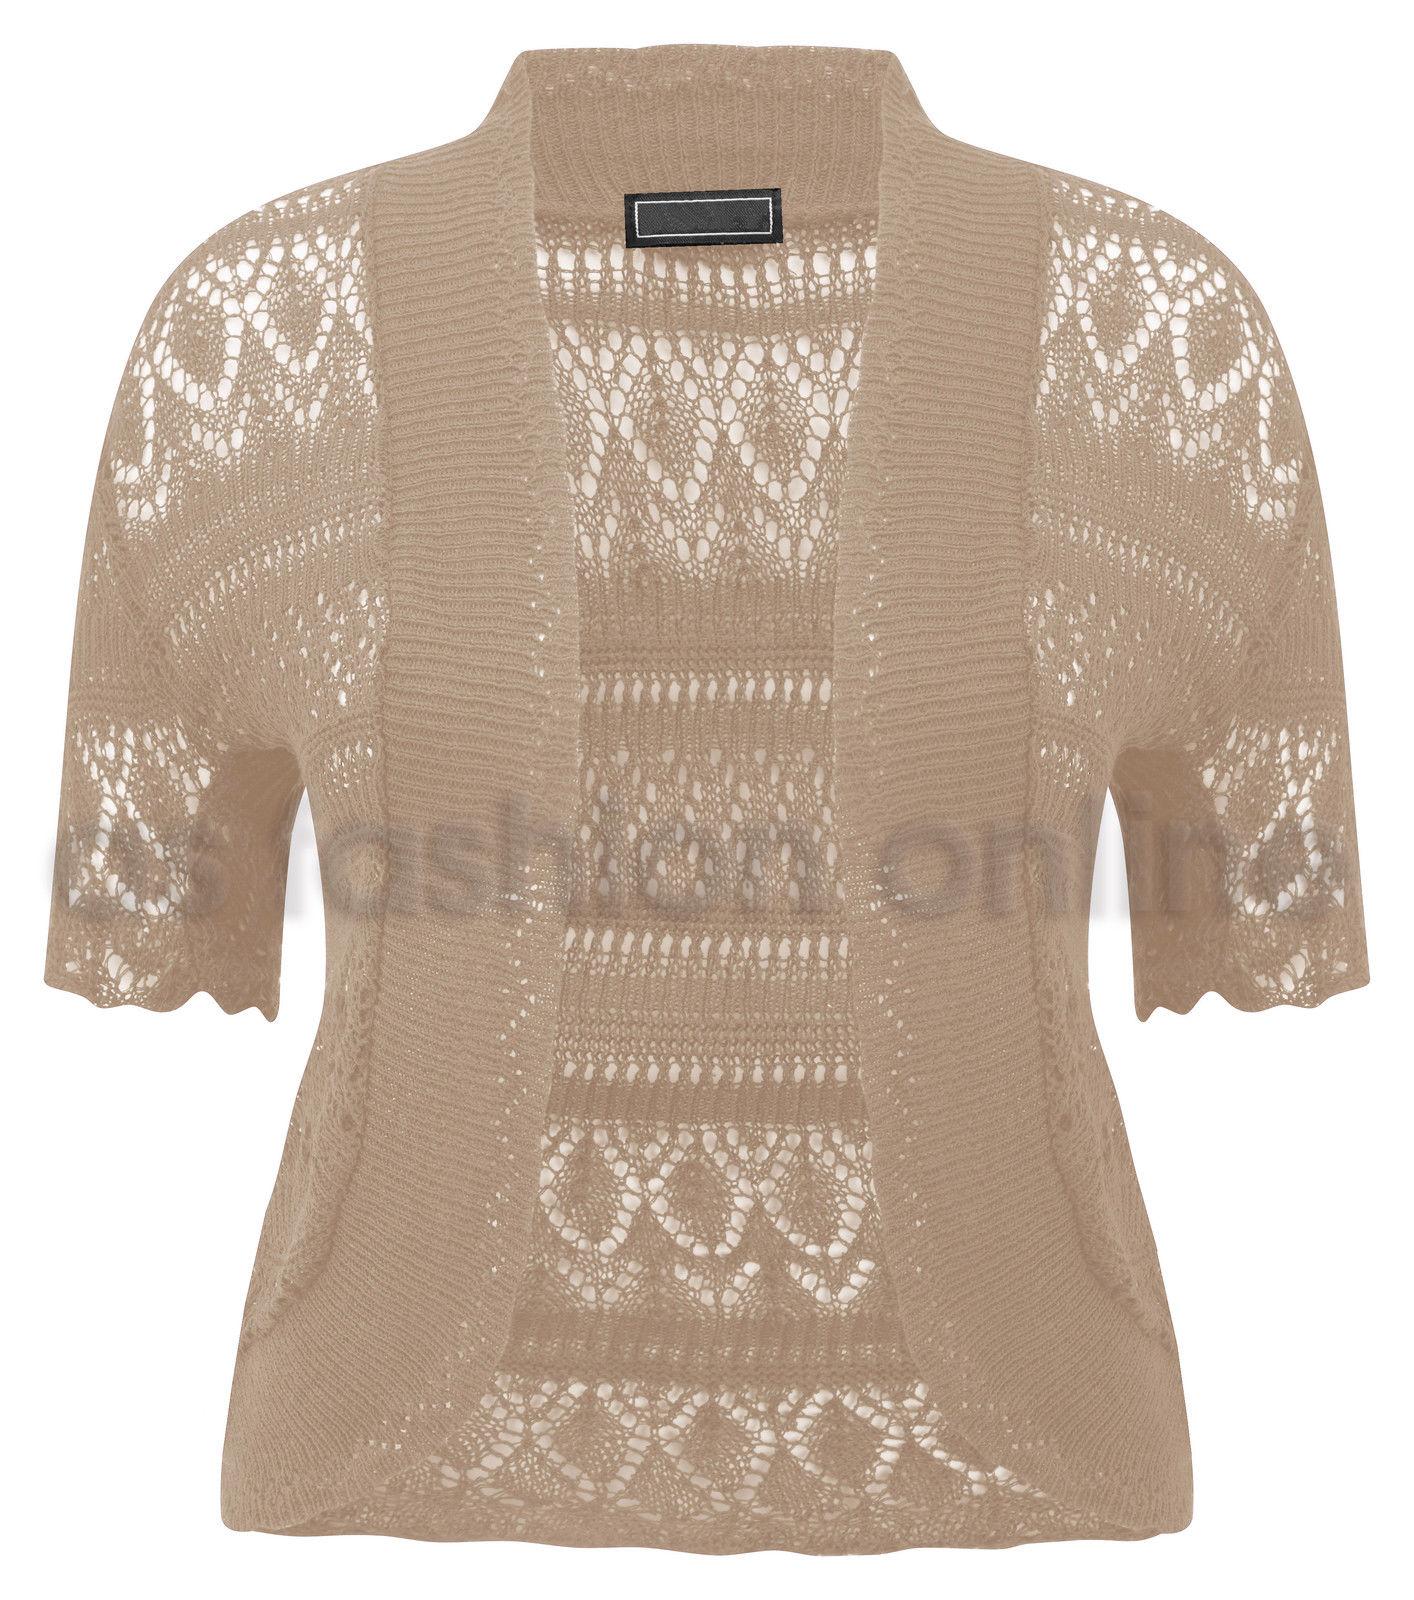 Ladies Womens Plus Size Crochet Knit Bolero Shrug Size 16 18 20